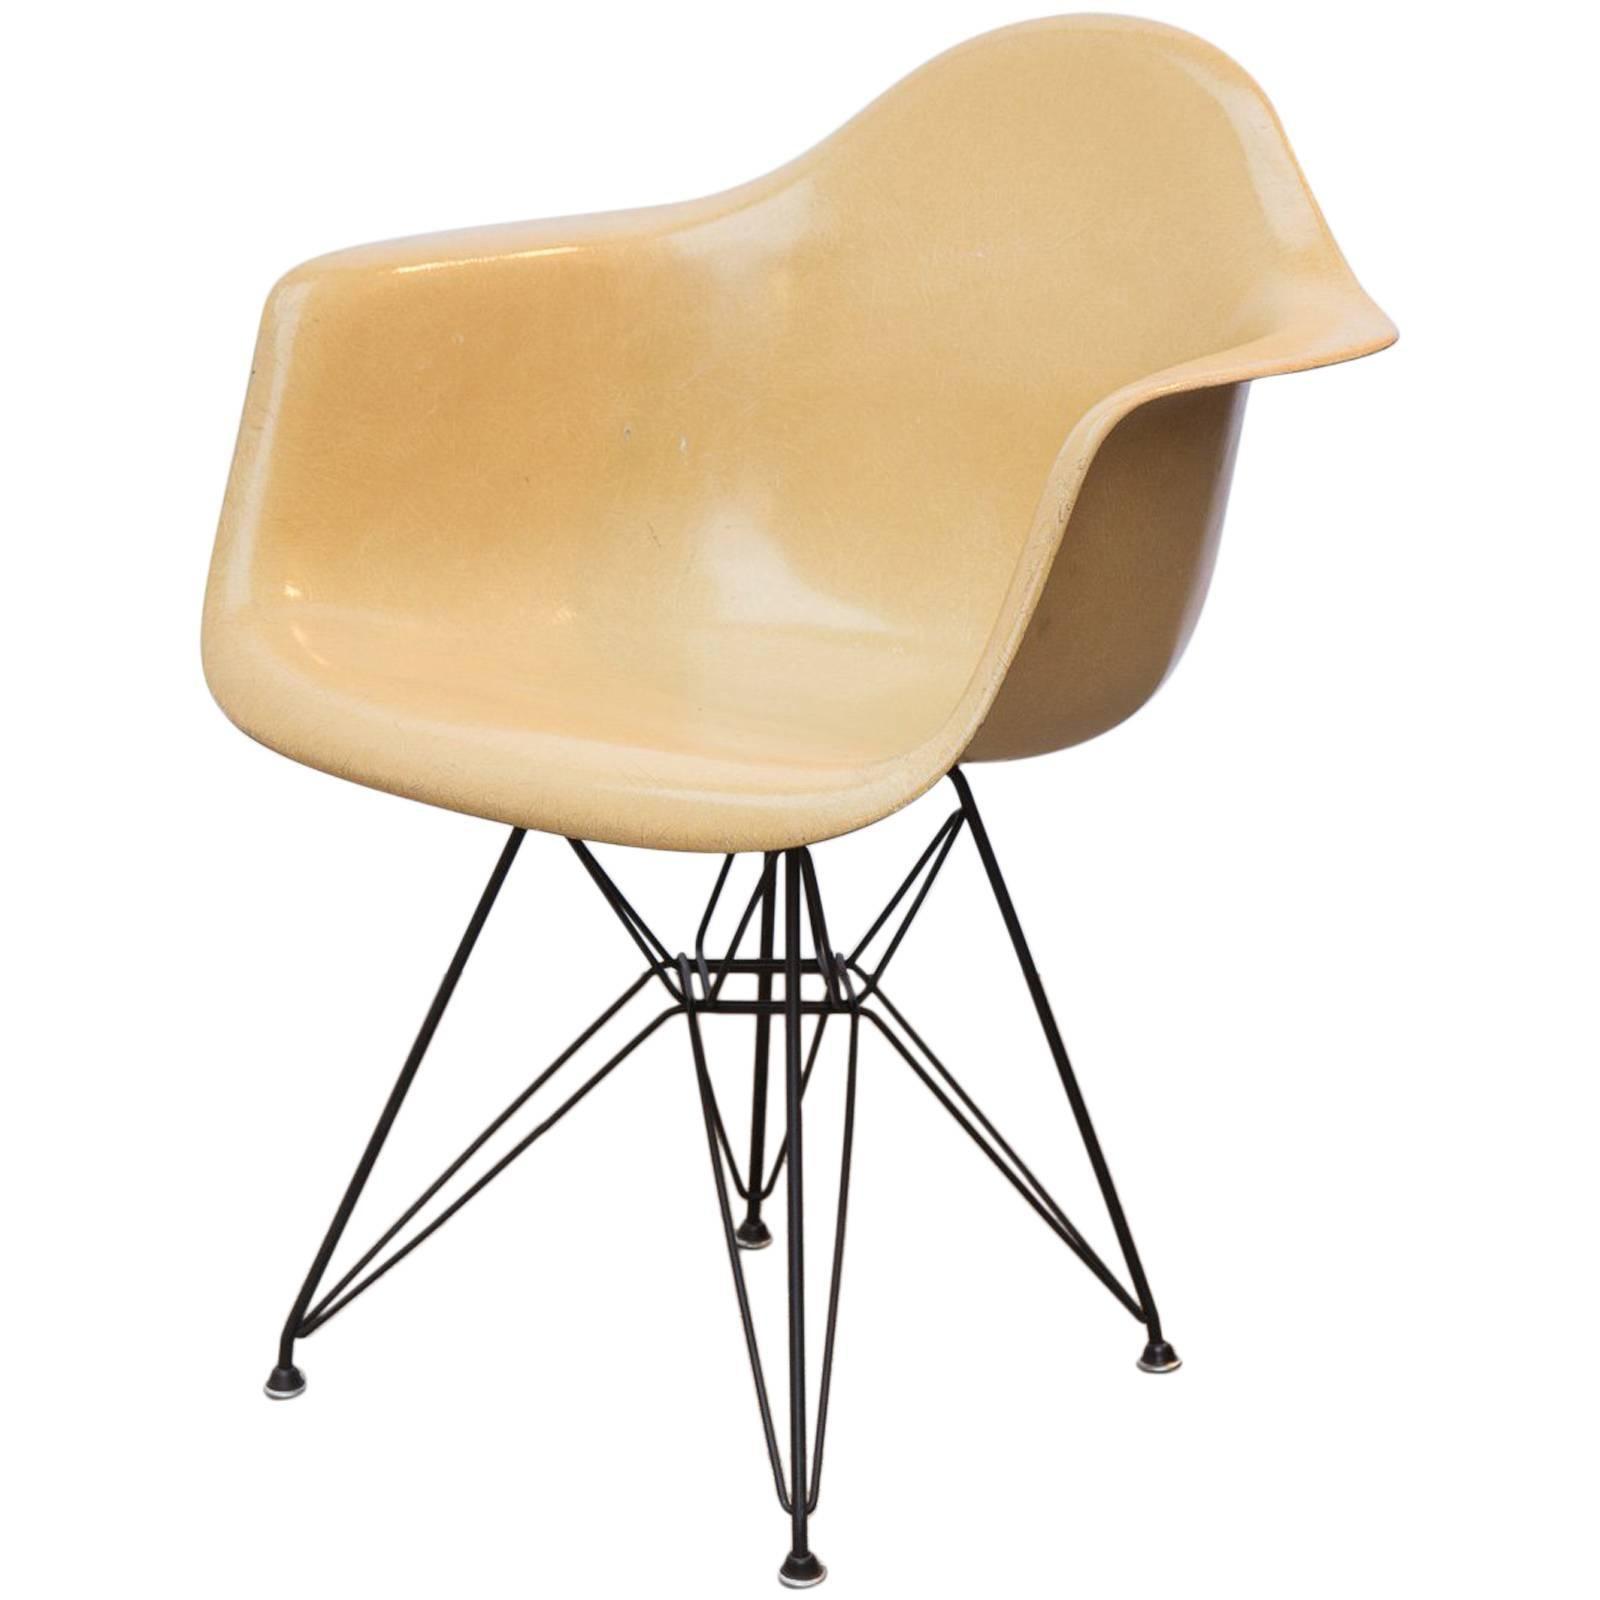 Eames for Herman Miller DAR Fiberglass Armchair in Yellow